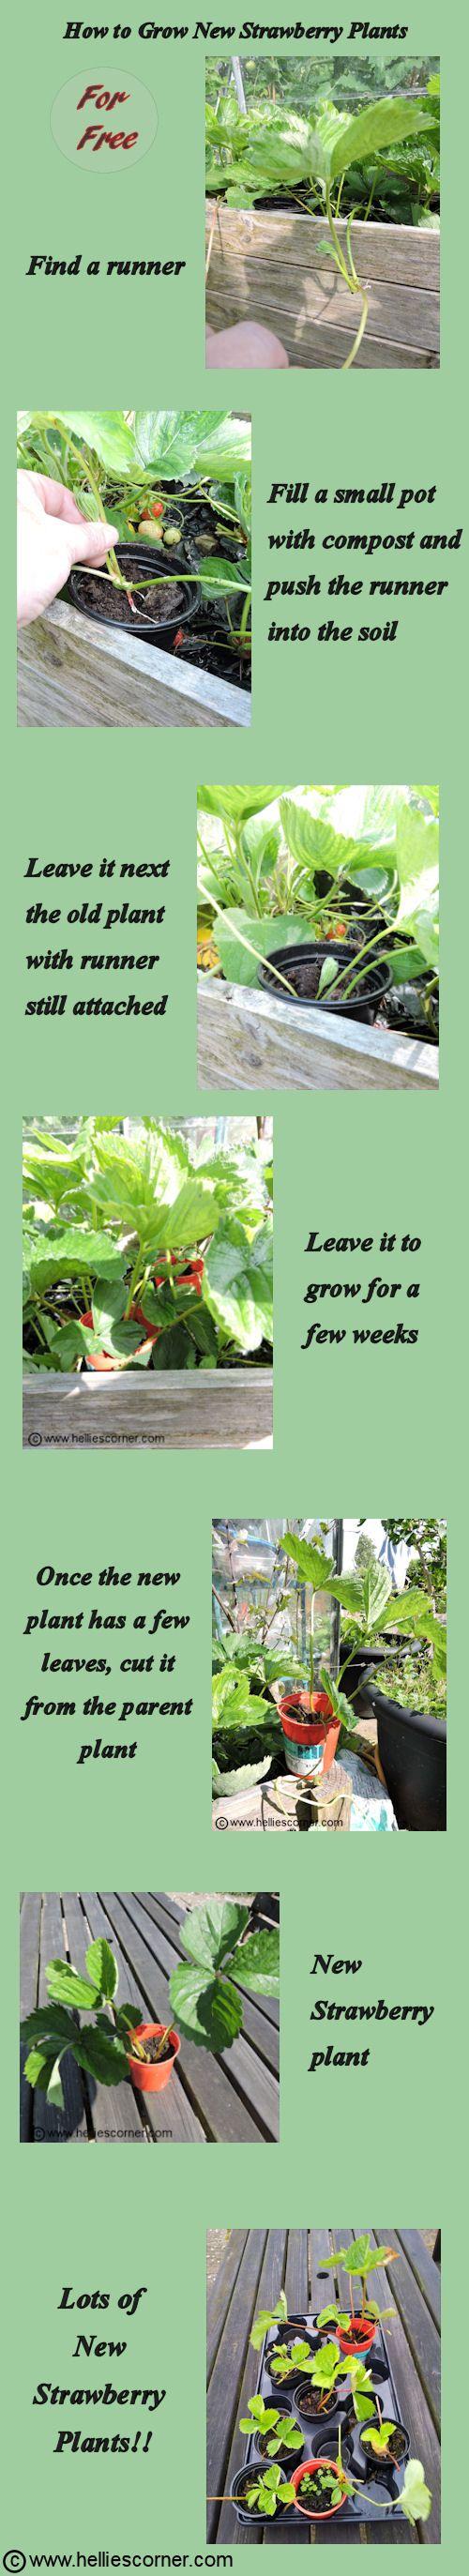 How To Grow New Strawberry Plants - for free | Hellie's Corner http://www.helliescorner.com/?p=3936